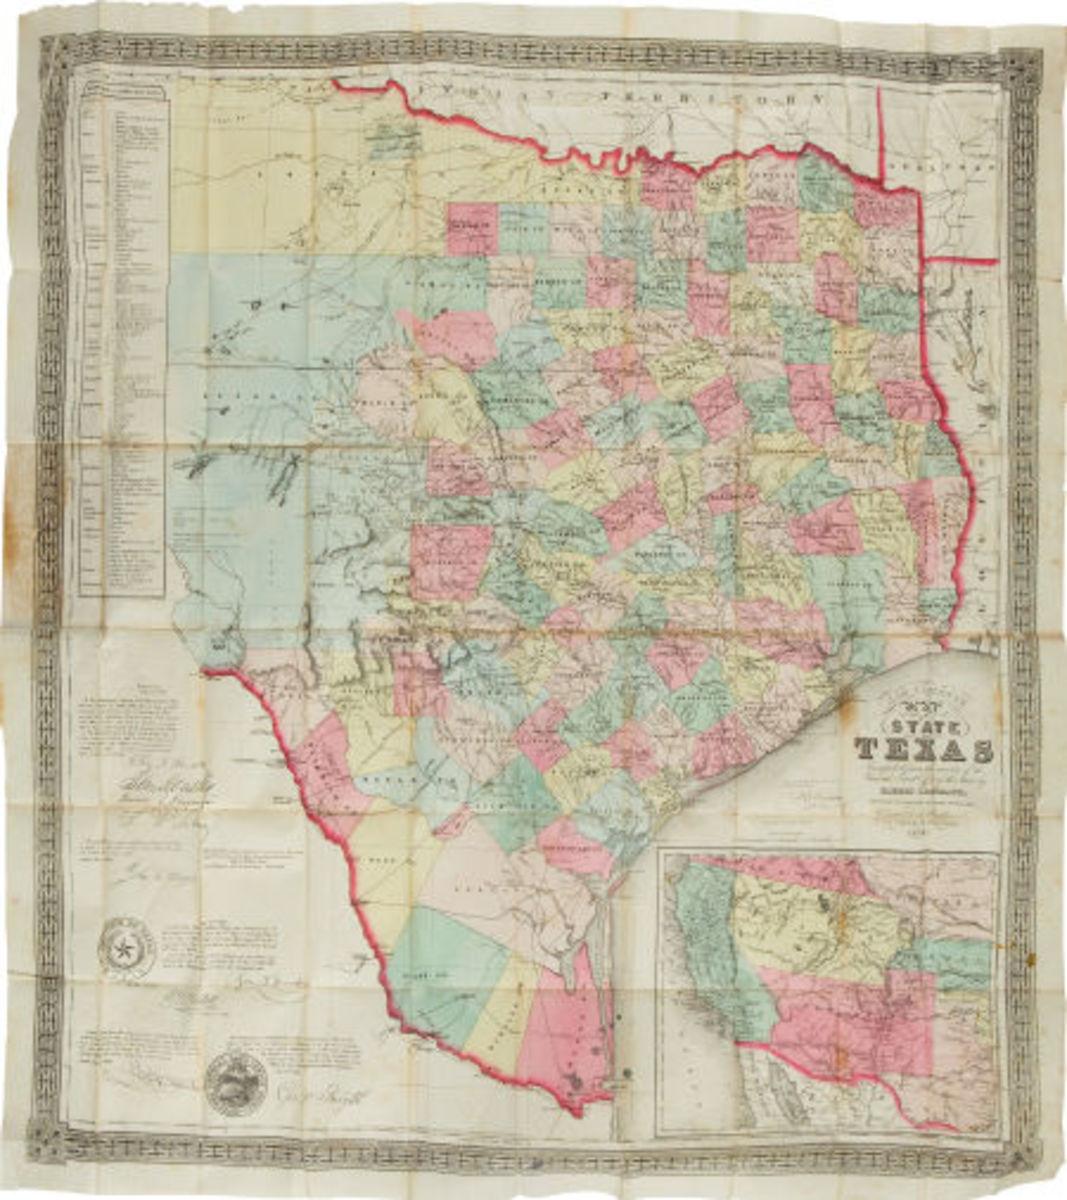 Jacob De Cordova. De Cordova's Map of Texas.